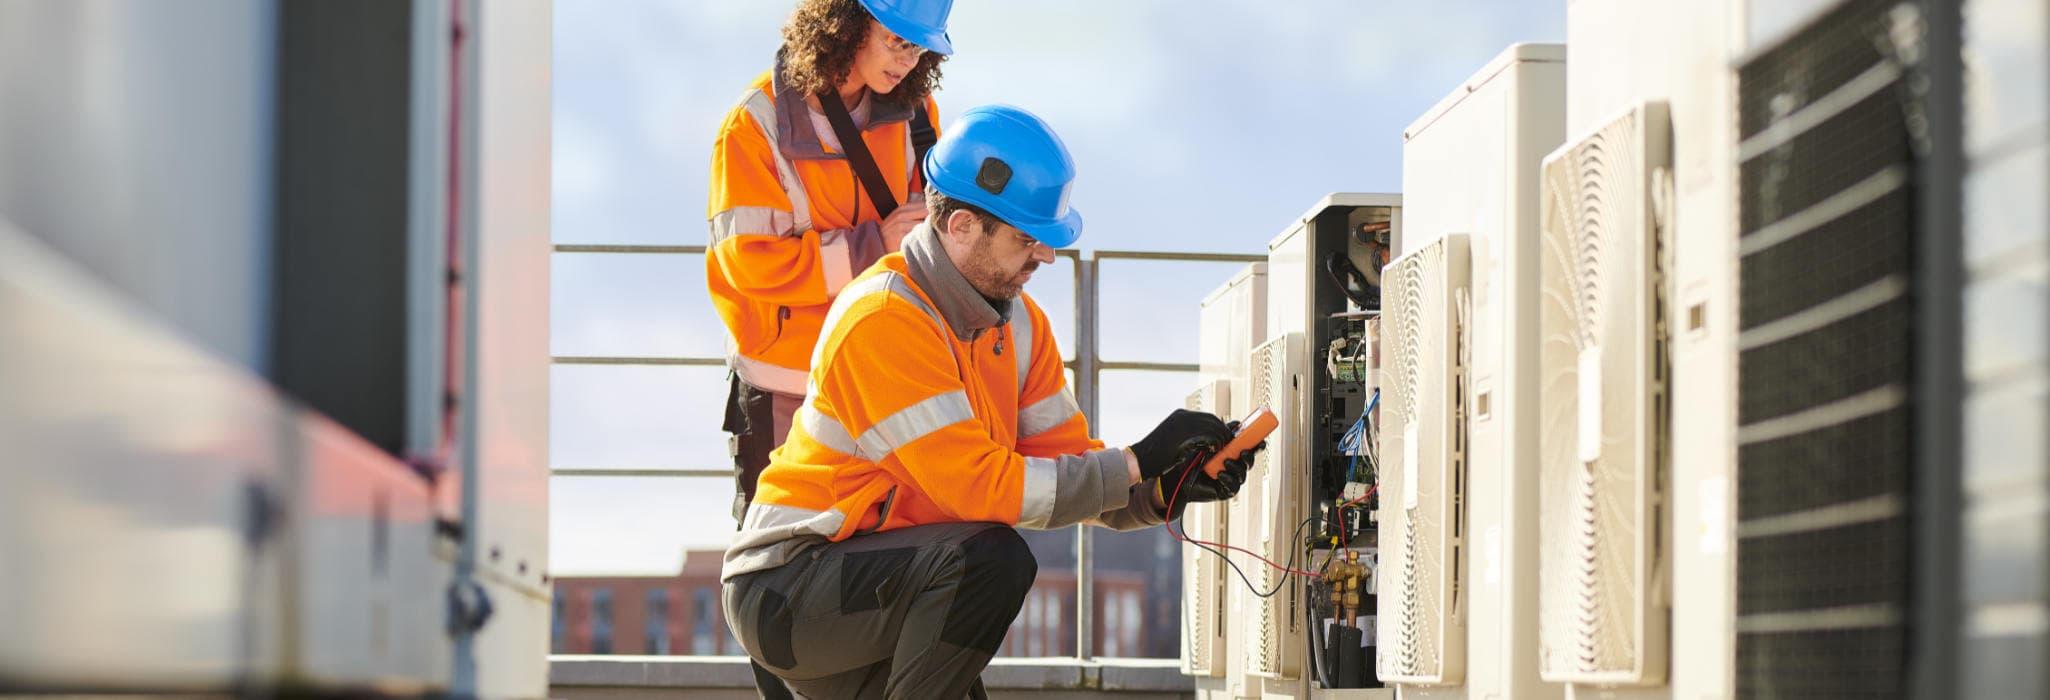 Commercial maintenance service.